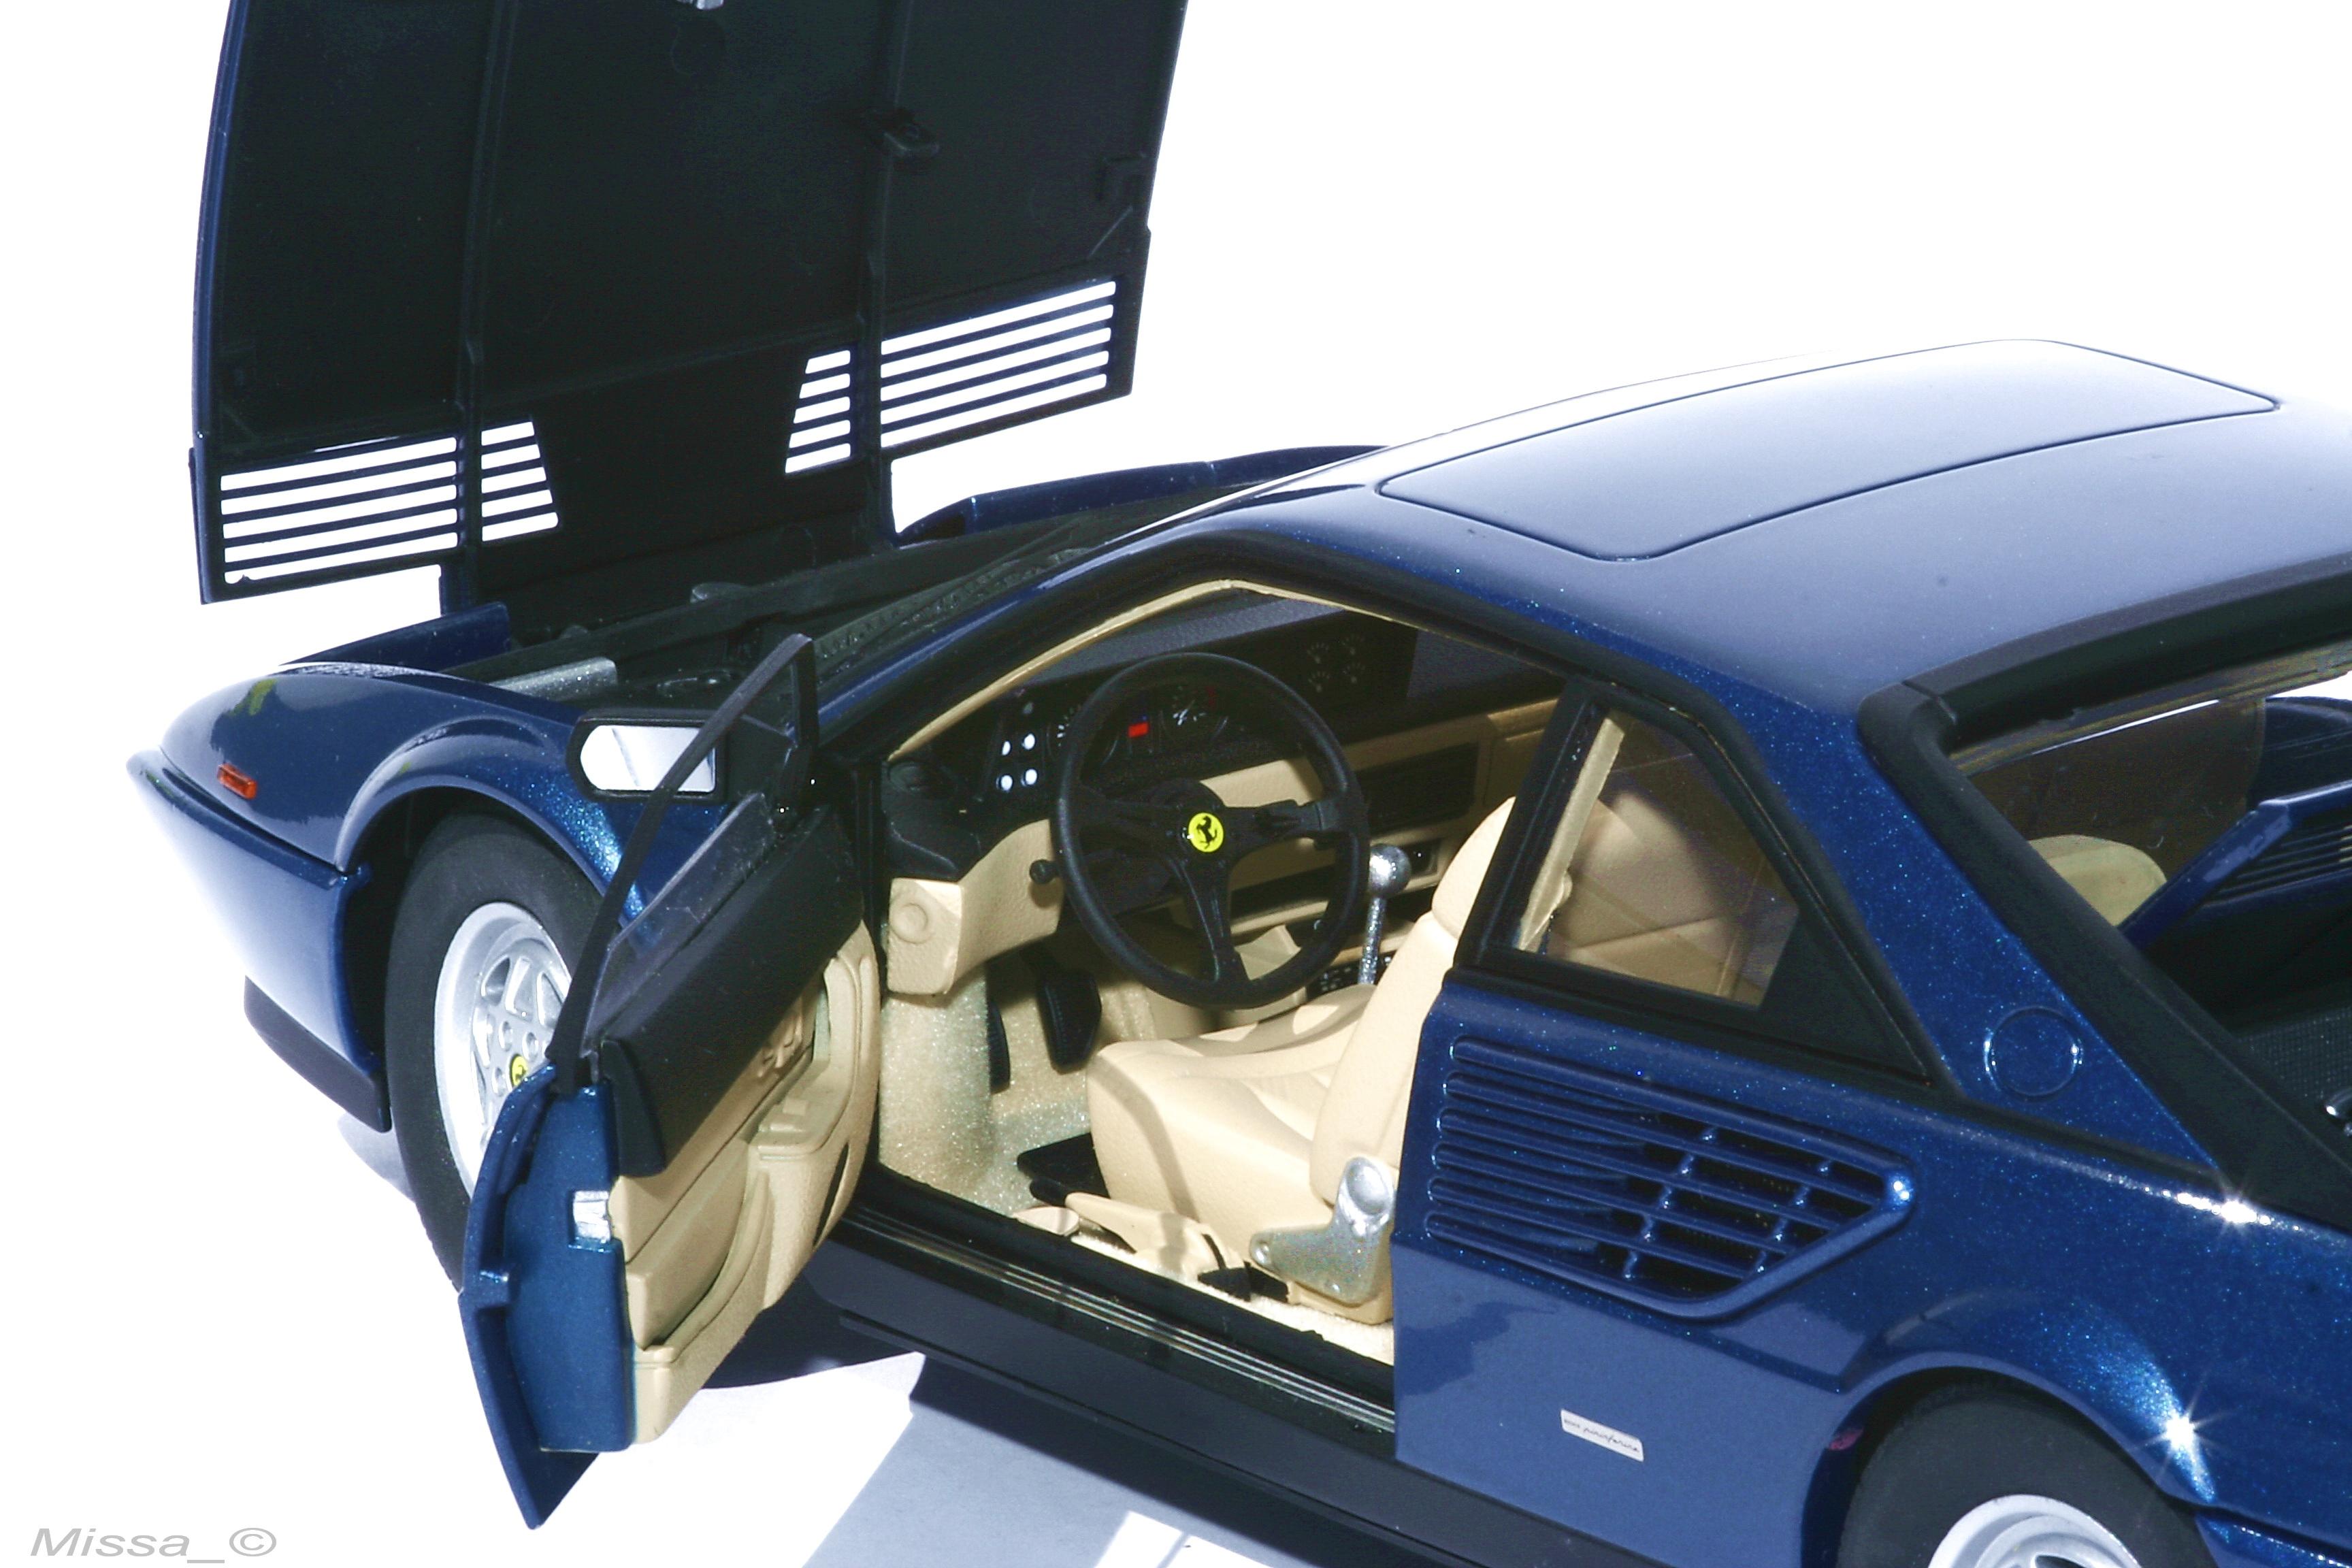 030_elite_ferrari_monqvjot Fabulous Ferrari Mondial 8 Super Elite Cars Trend